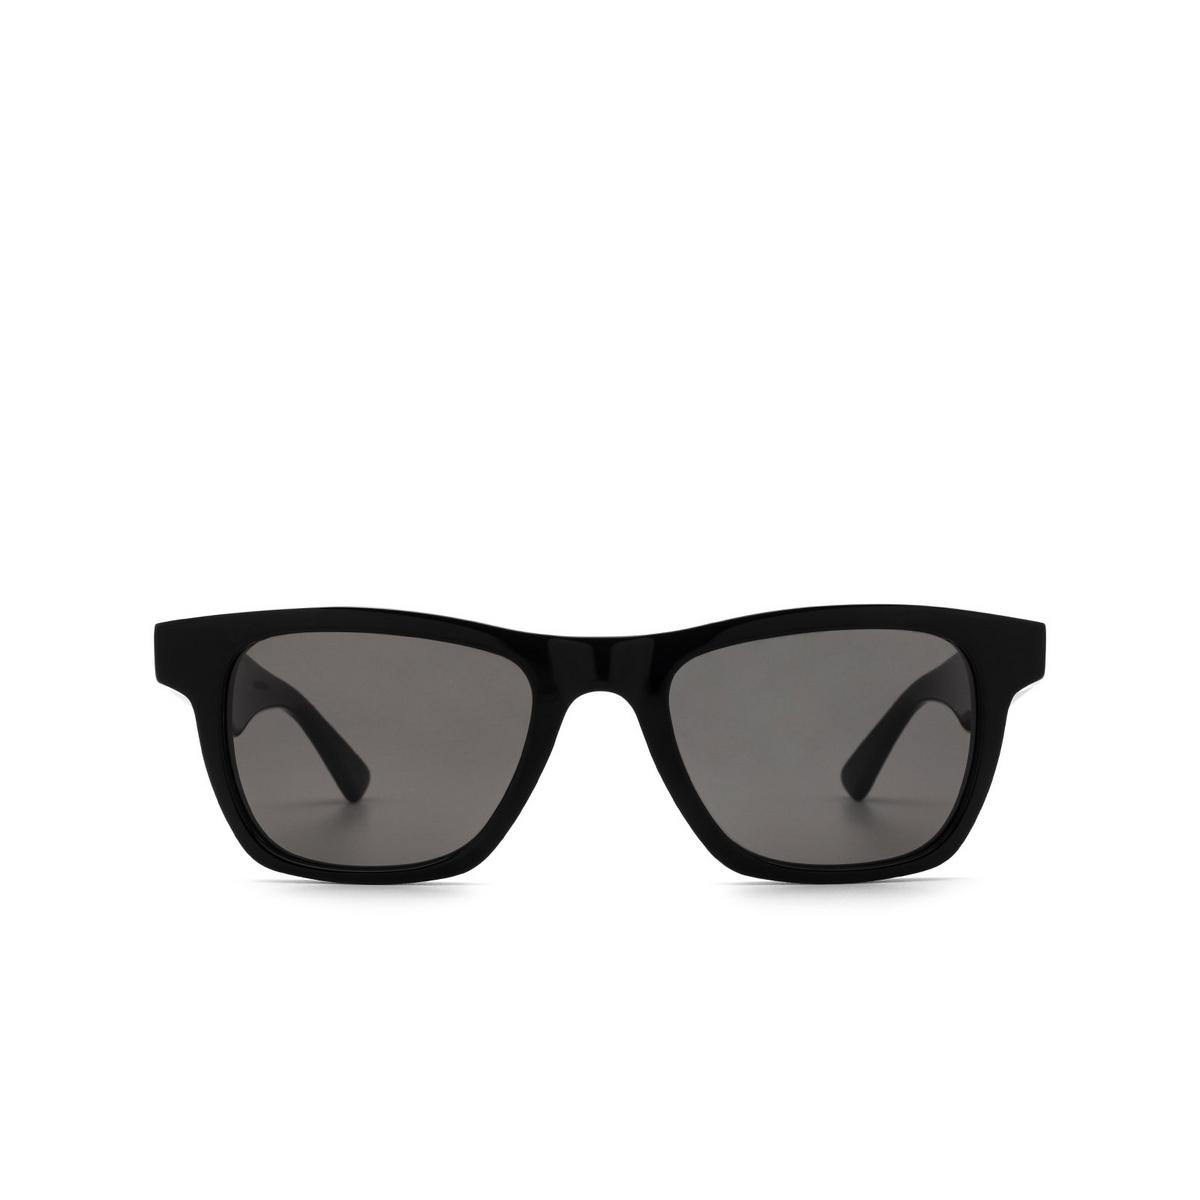 Bottega Veneta® Square Sunglasses: BV1120S color Black 001 - front view.